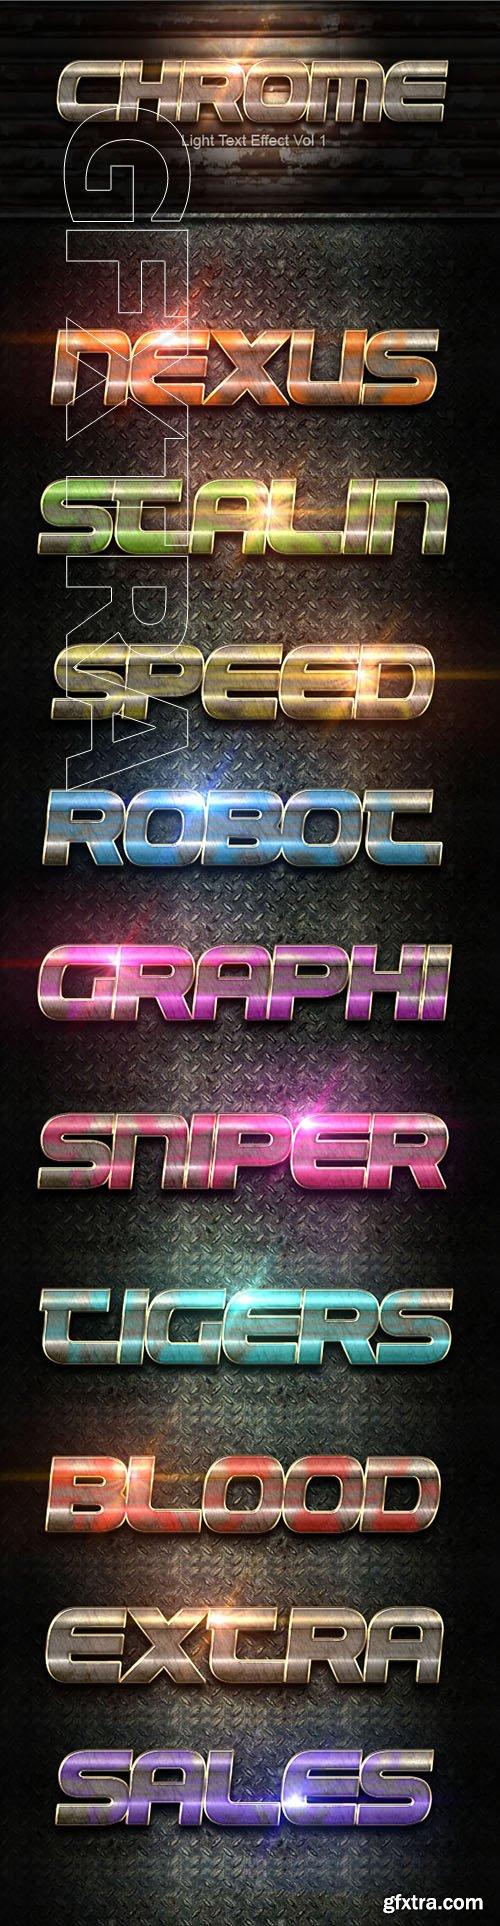 GraphicRiver - Chrome Light Text Effect 40 22223798